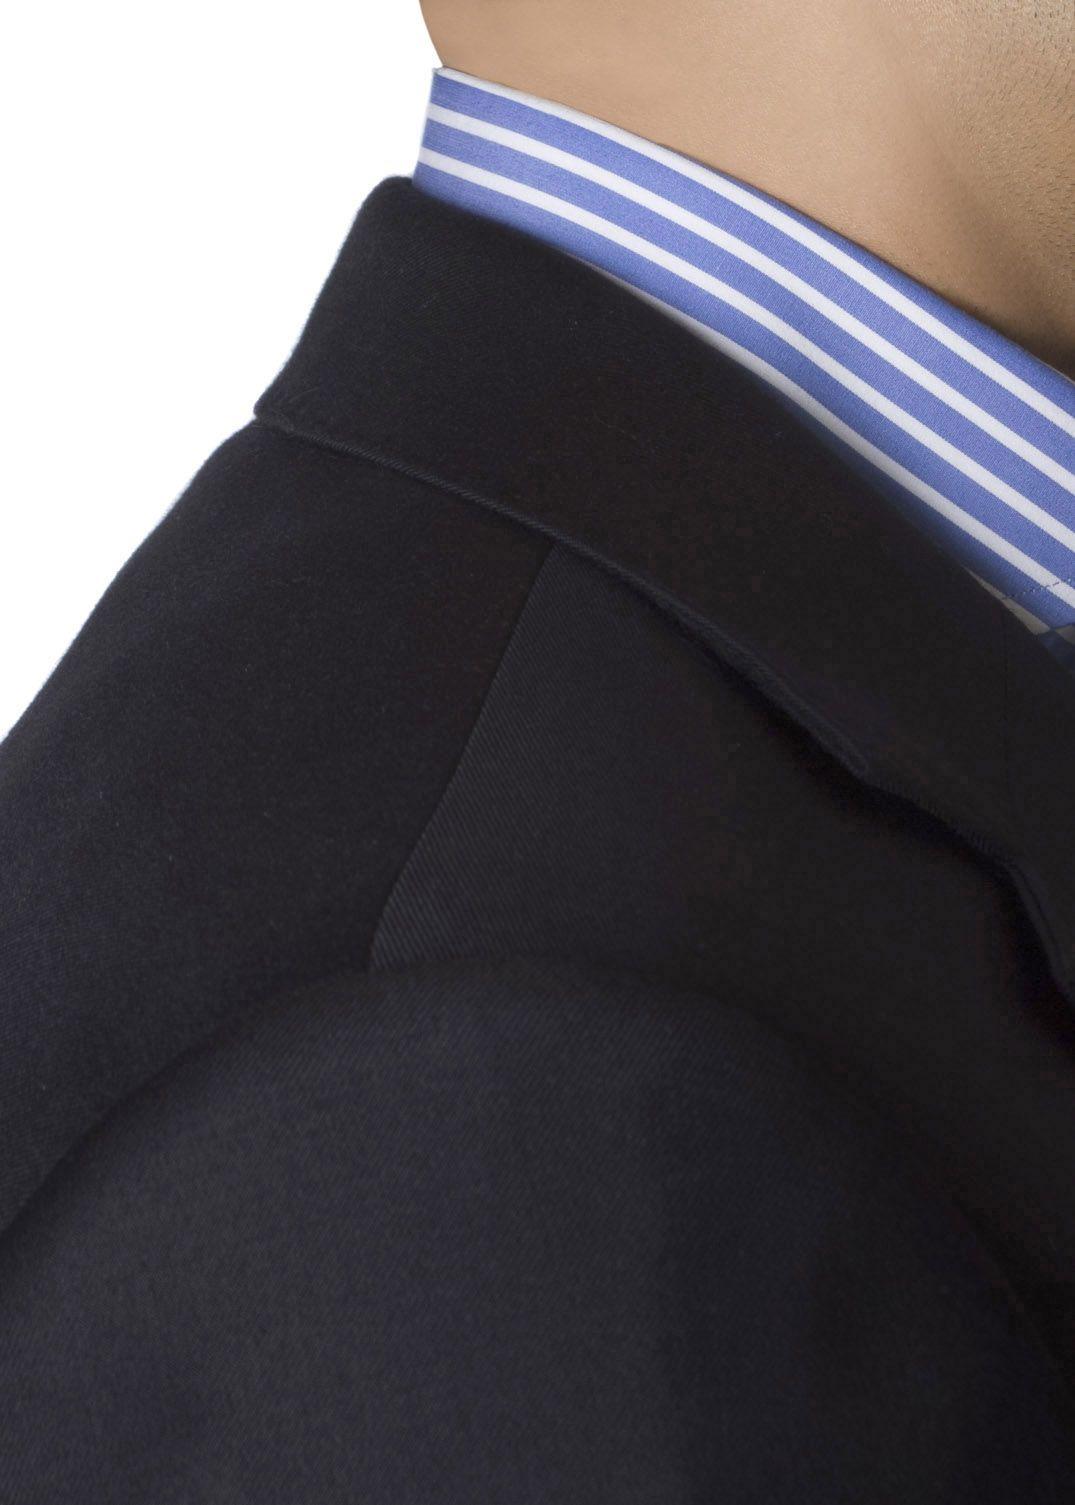 Collar Gap Ideal